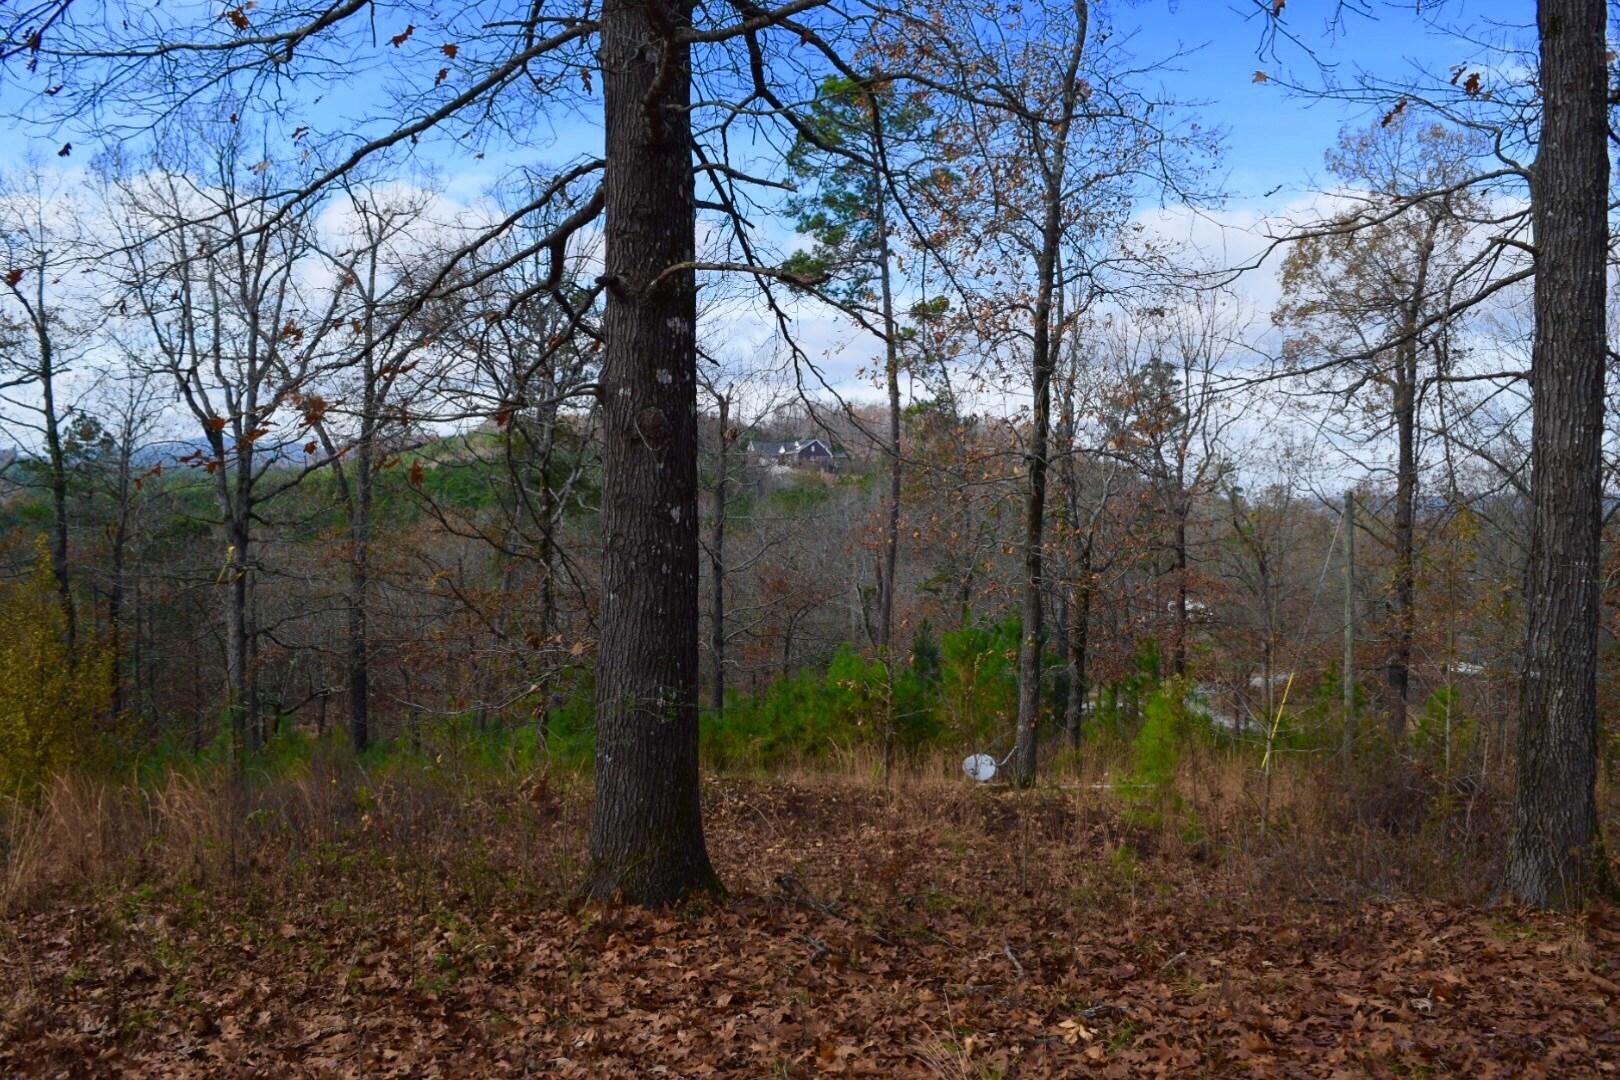 Land for sale/Acreage/Hilltop/Mountain/Glenwood Arkansas